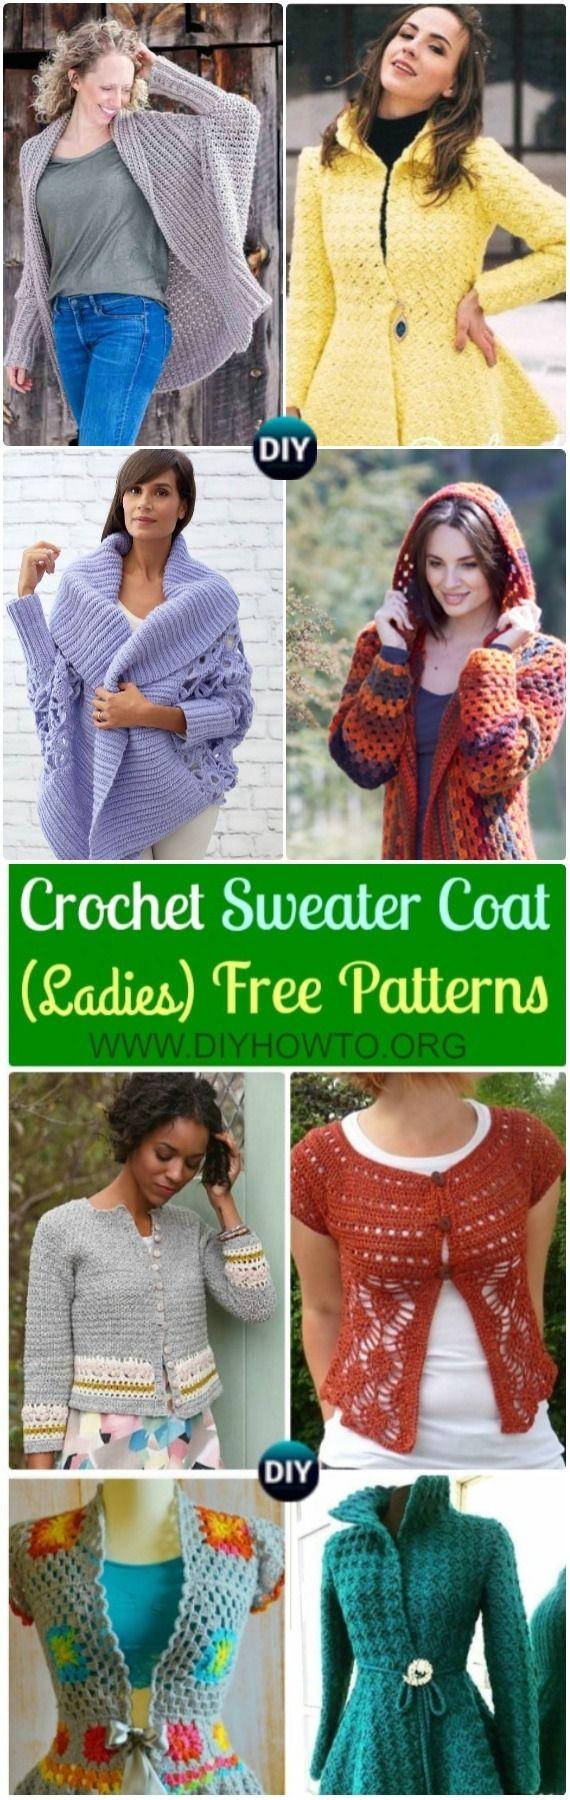 Crochet Women Sweater Coat Cardigan Free Patterns: Crochet Open Front Sweater Coat, Button Up Sweater Coat, Zip Up Sweater Cardigan